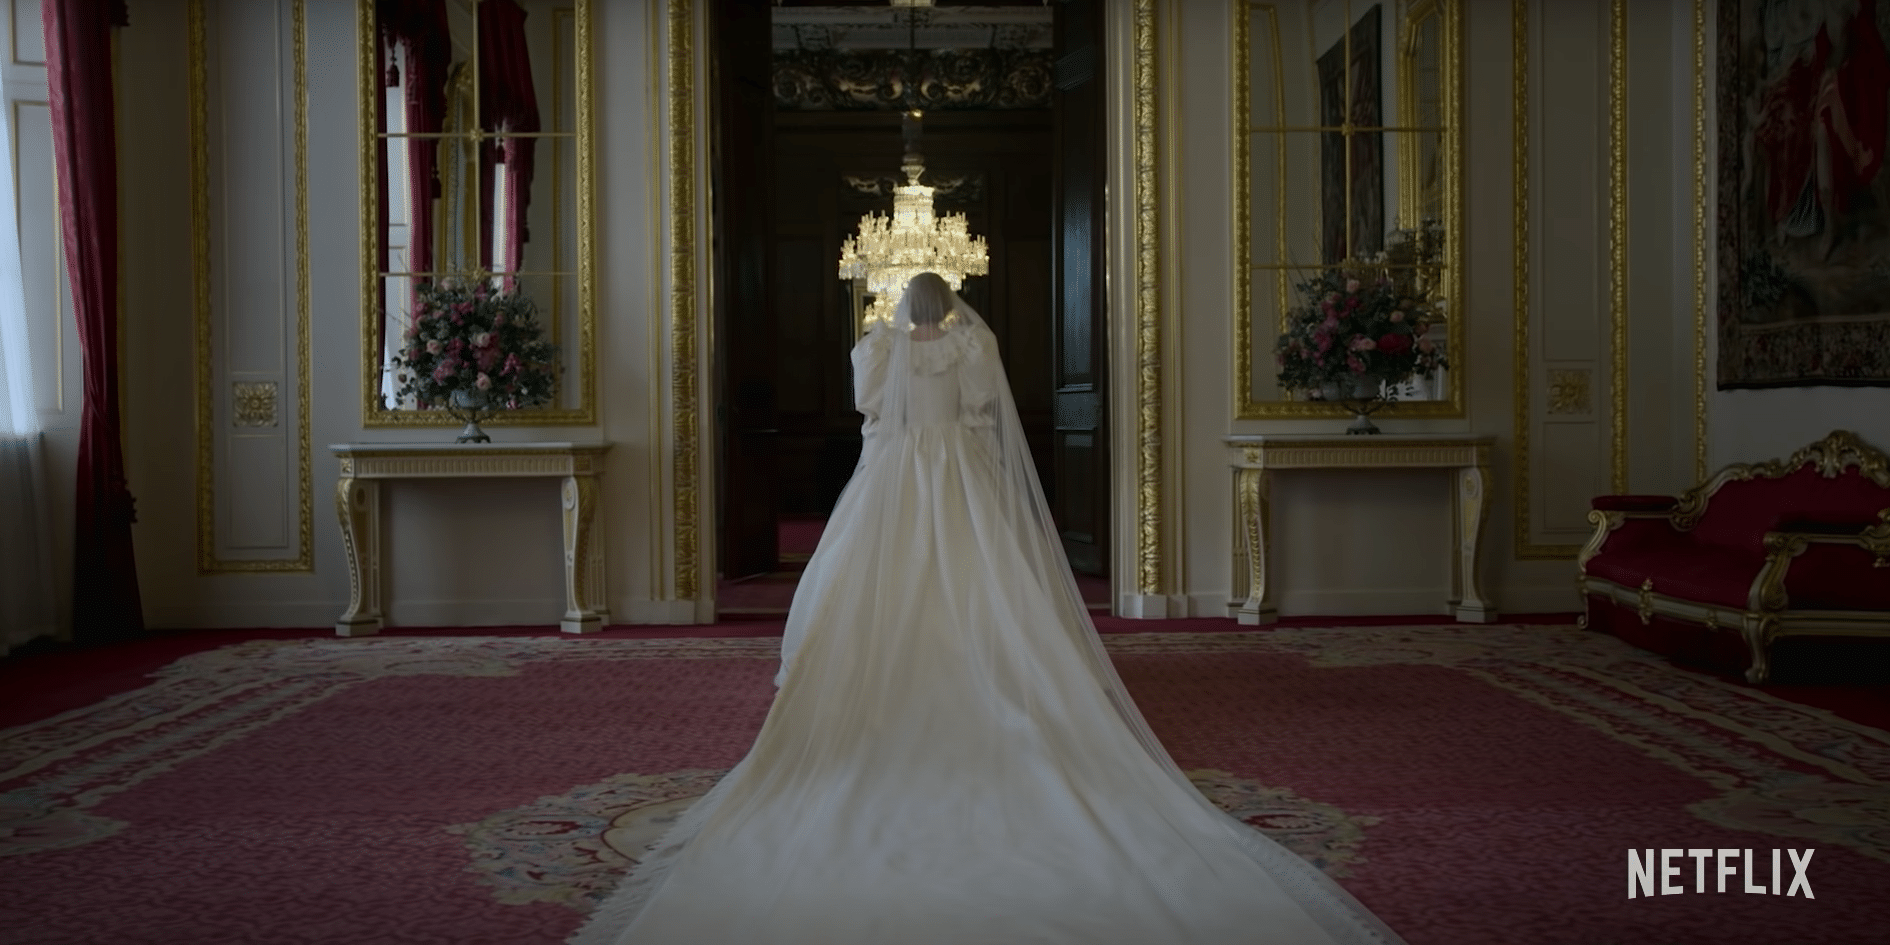 Princess Diana Wedding Dress in The Crown